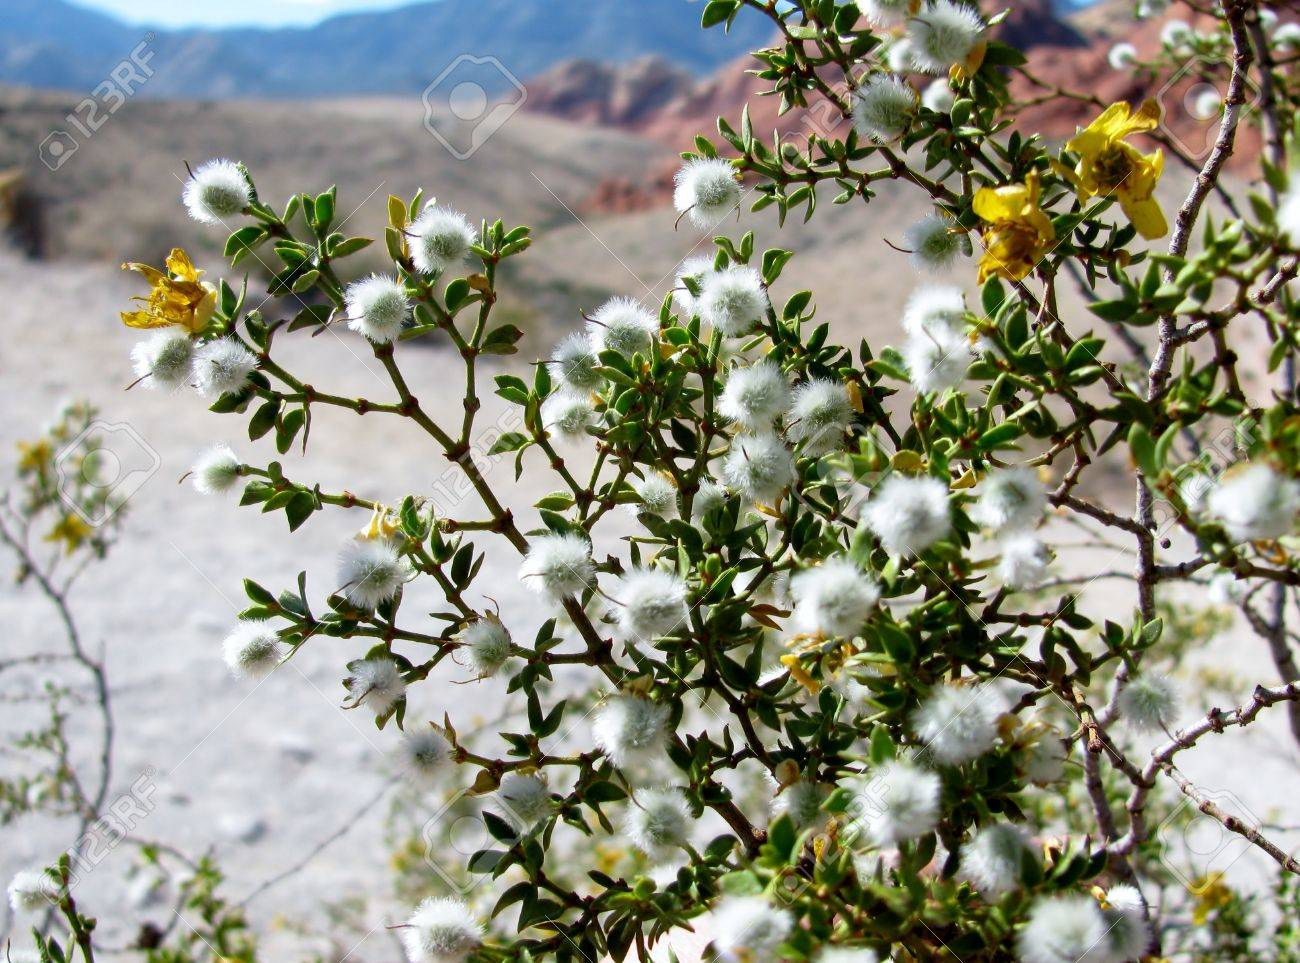 Virgínia Dawn Hope - Seeker of knowledge - Página 2 14384931-Creosote-bush-in-Red-Rock-Canyon-Nevada-Stock-Photo